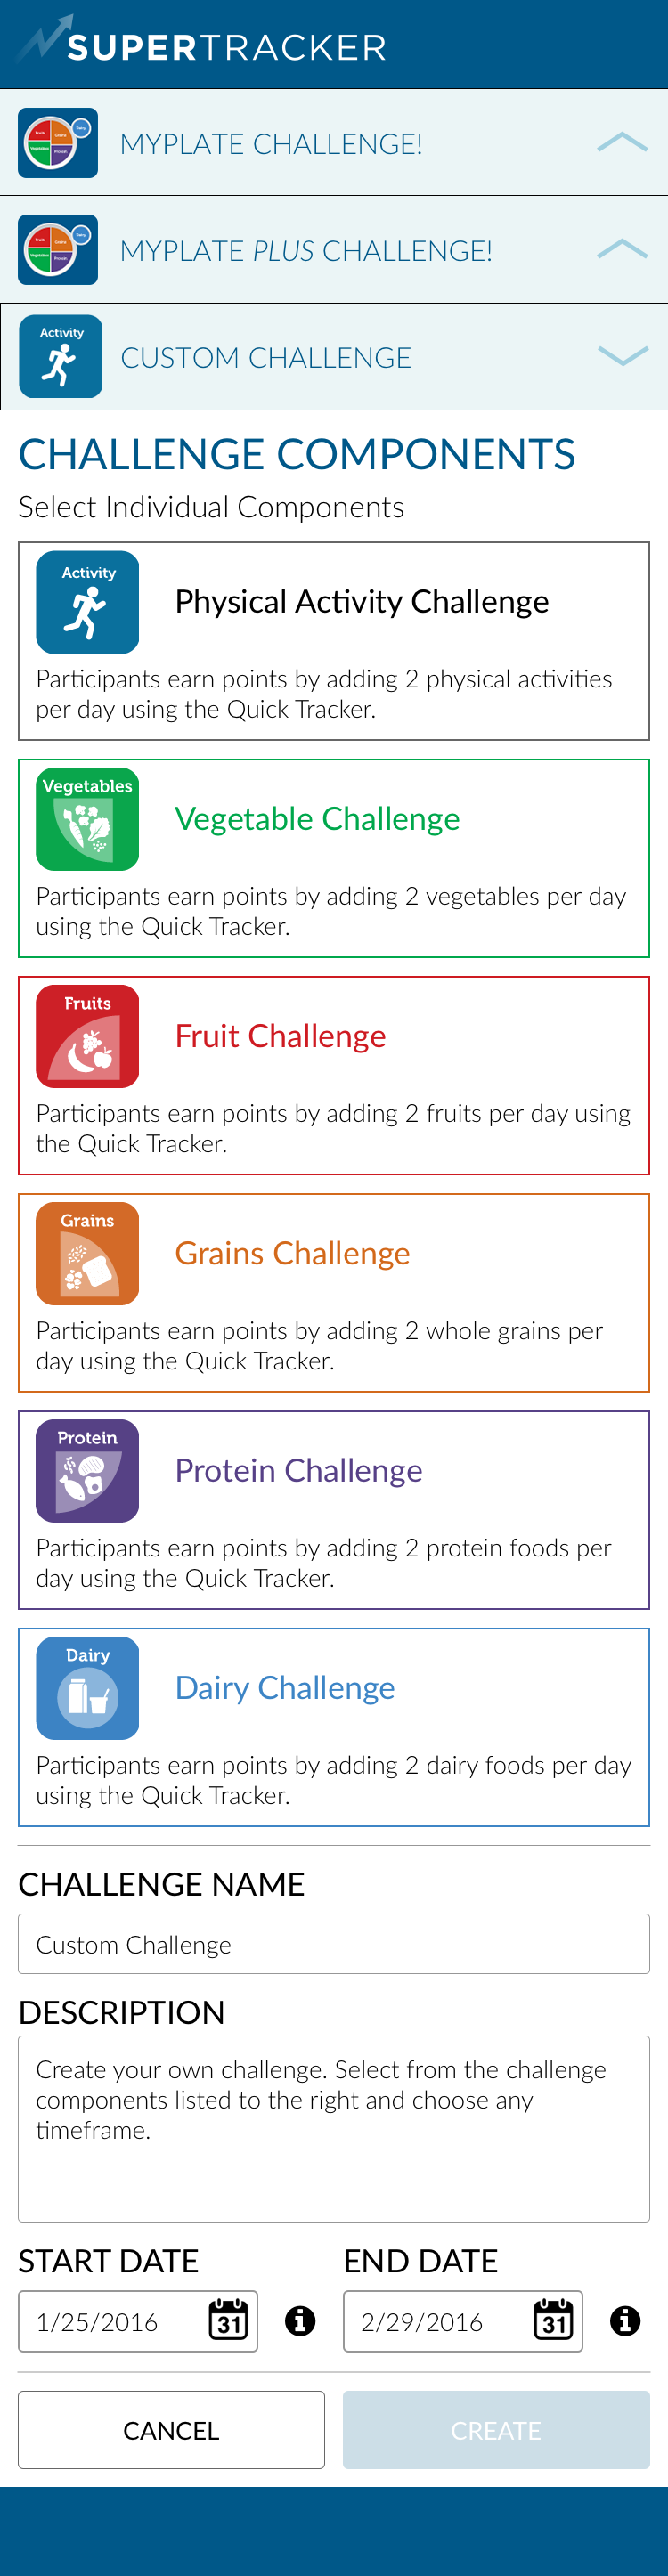 Custom Challenge - Components